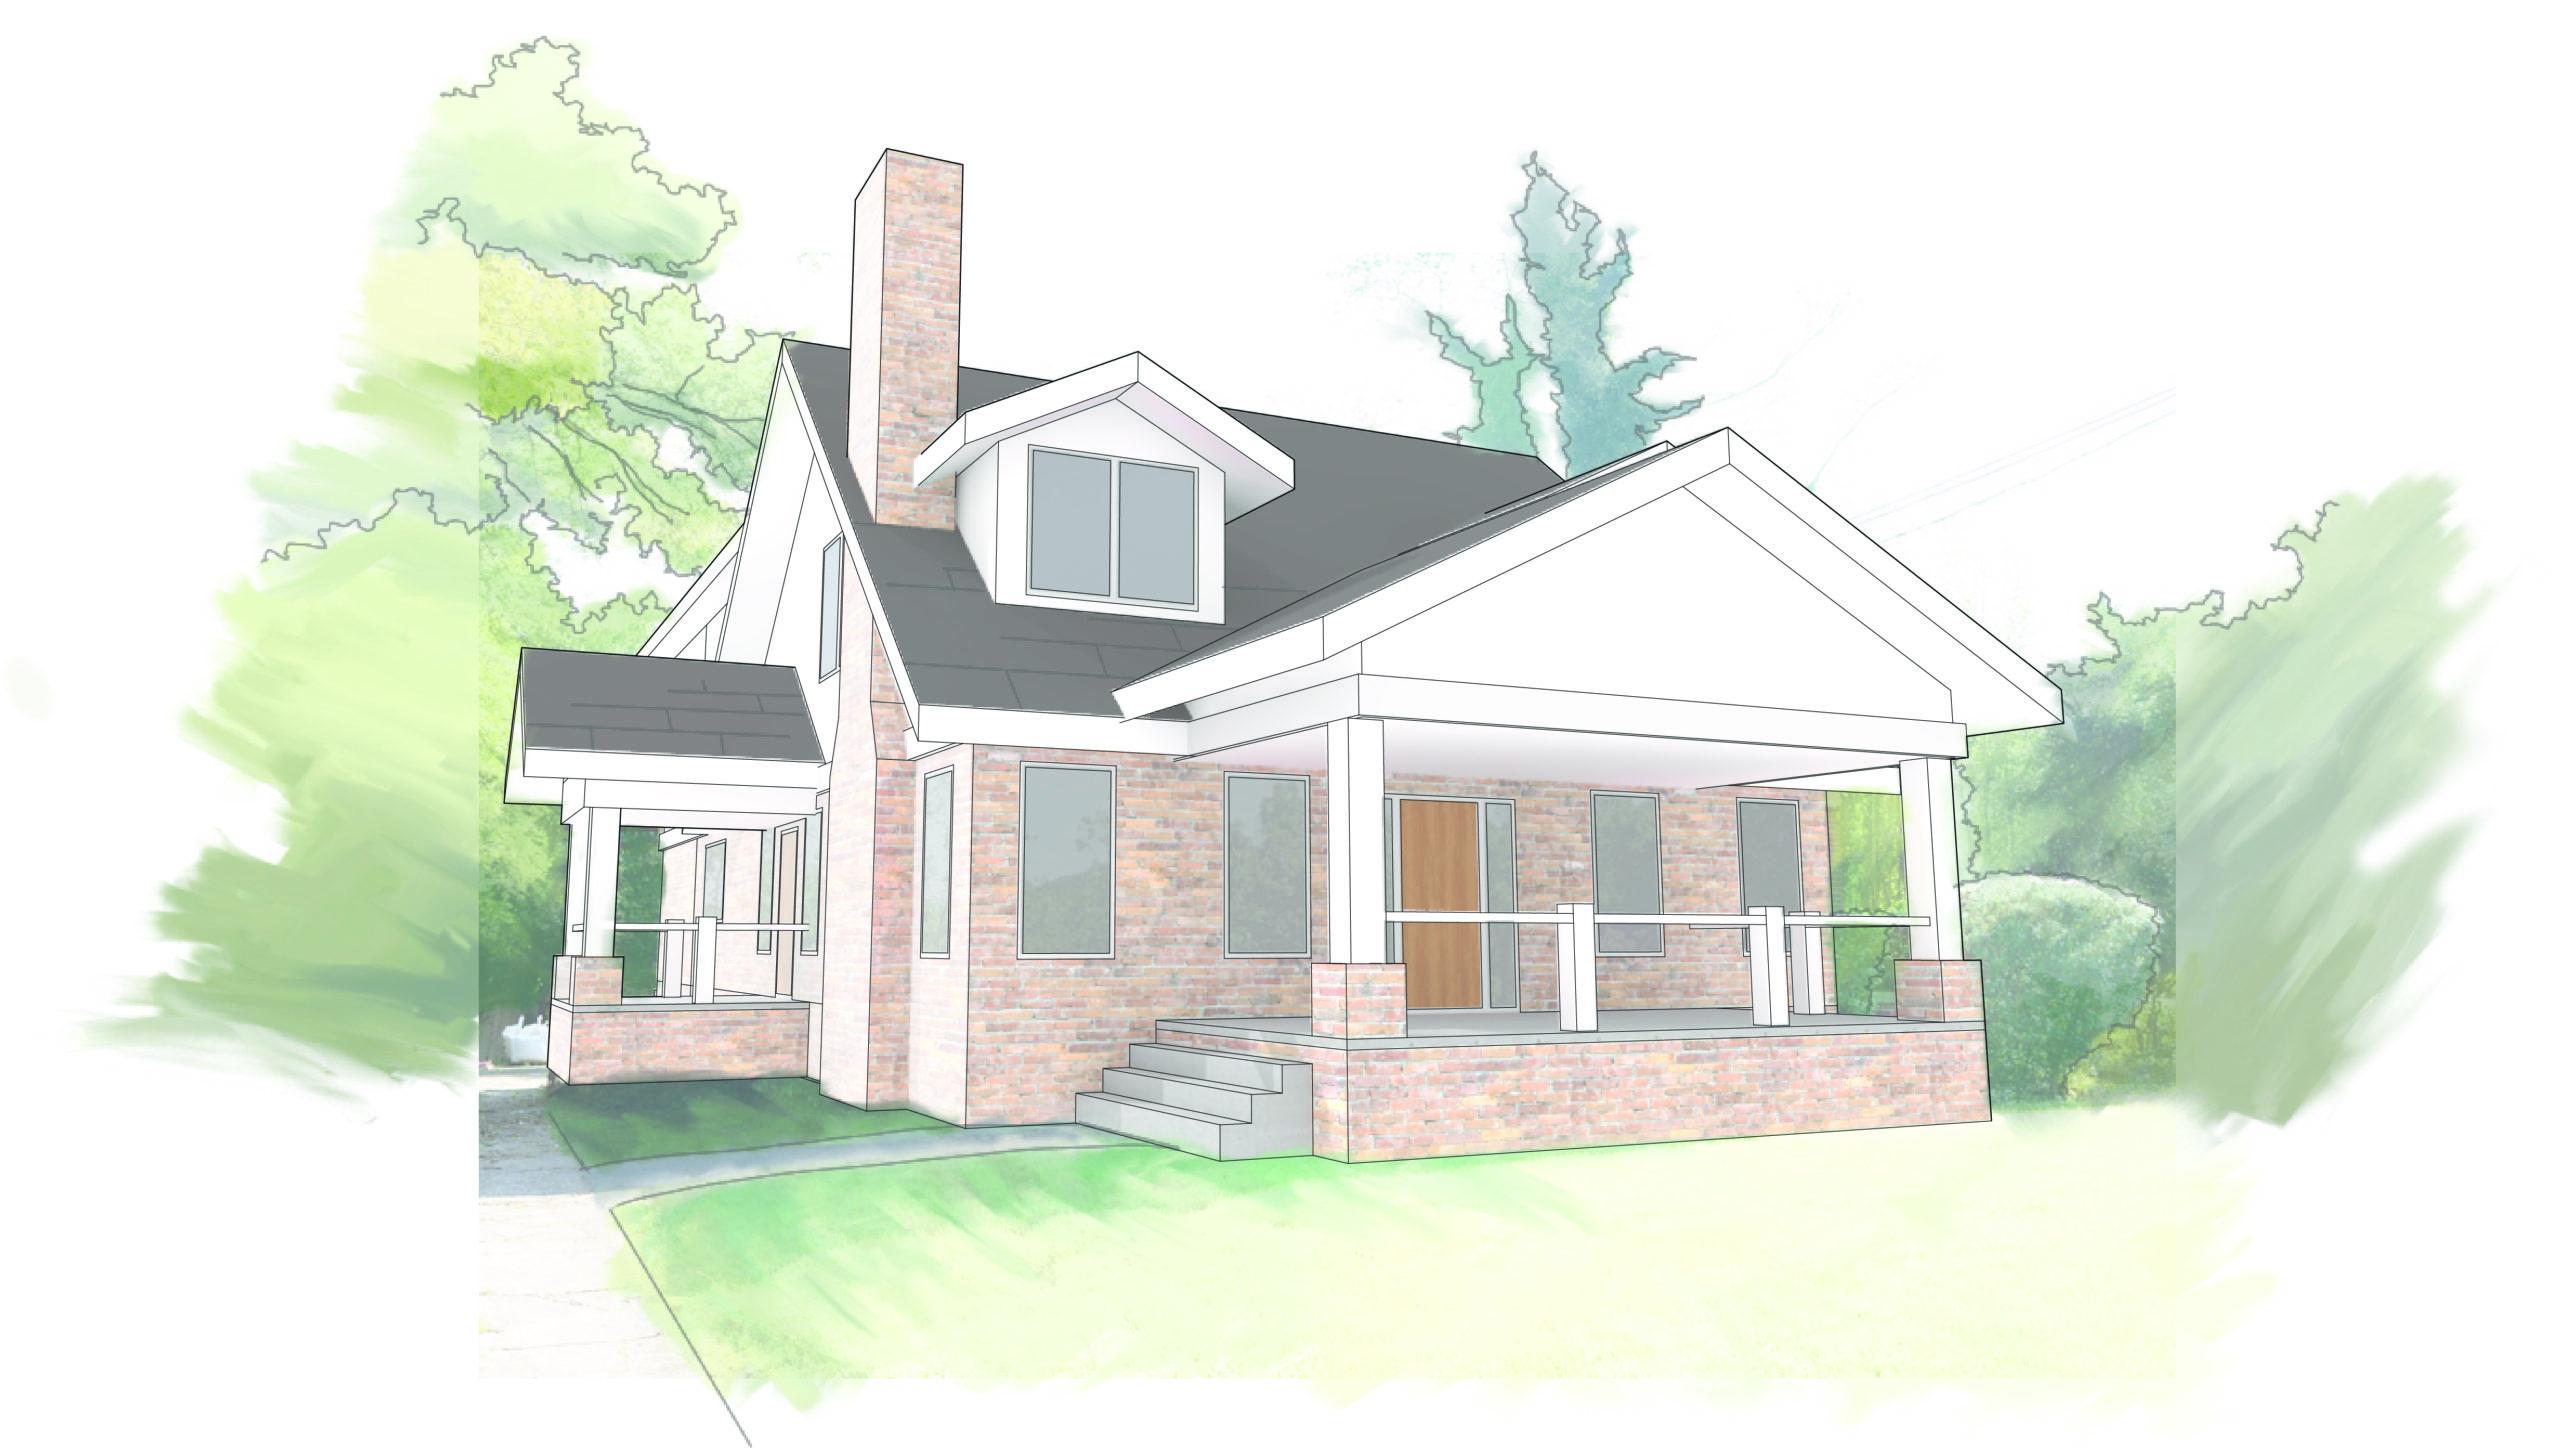 West Benson House Rendering for Lightroom Studio